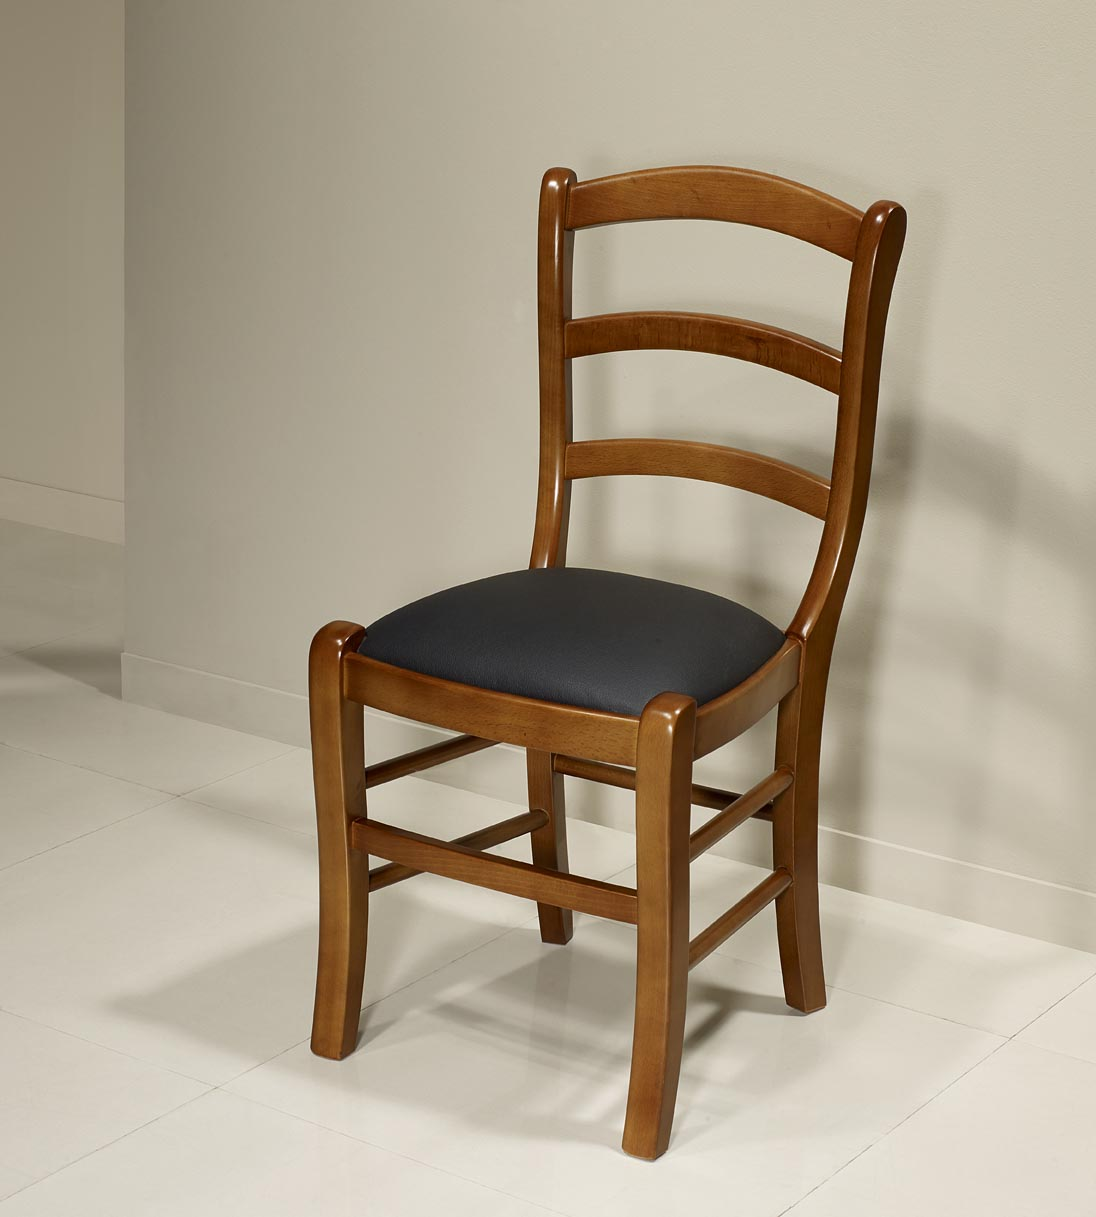 Chaise Madeleine En Htre Massif De Style Louis Philippe